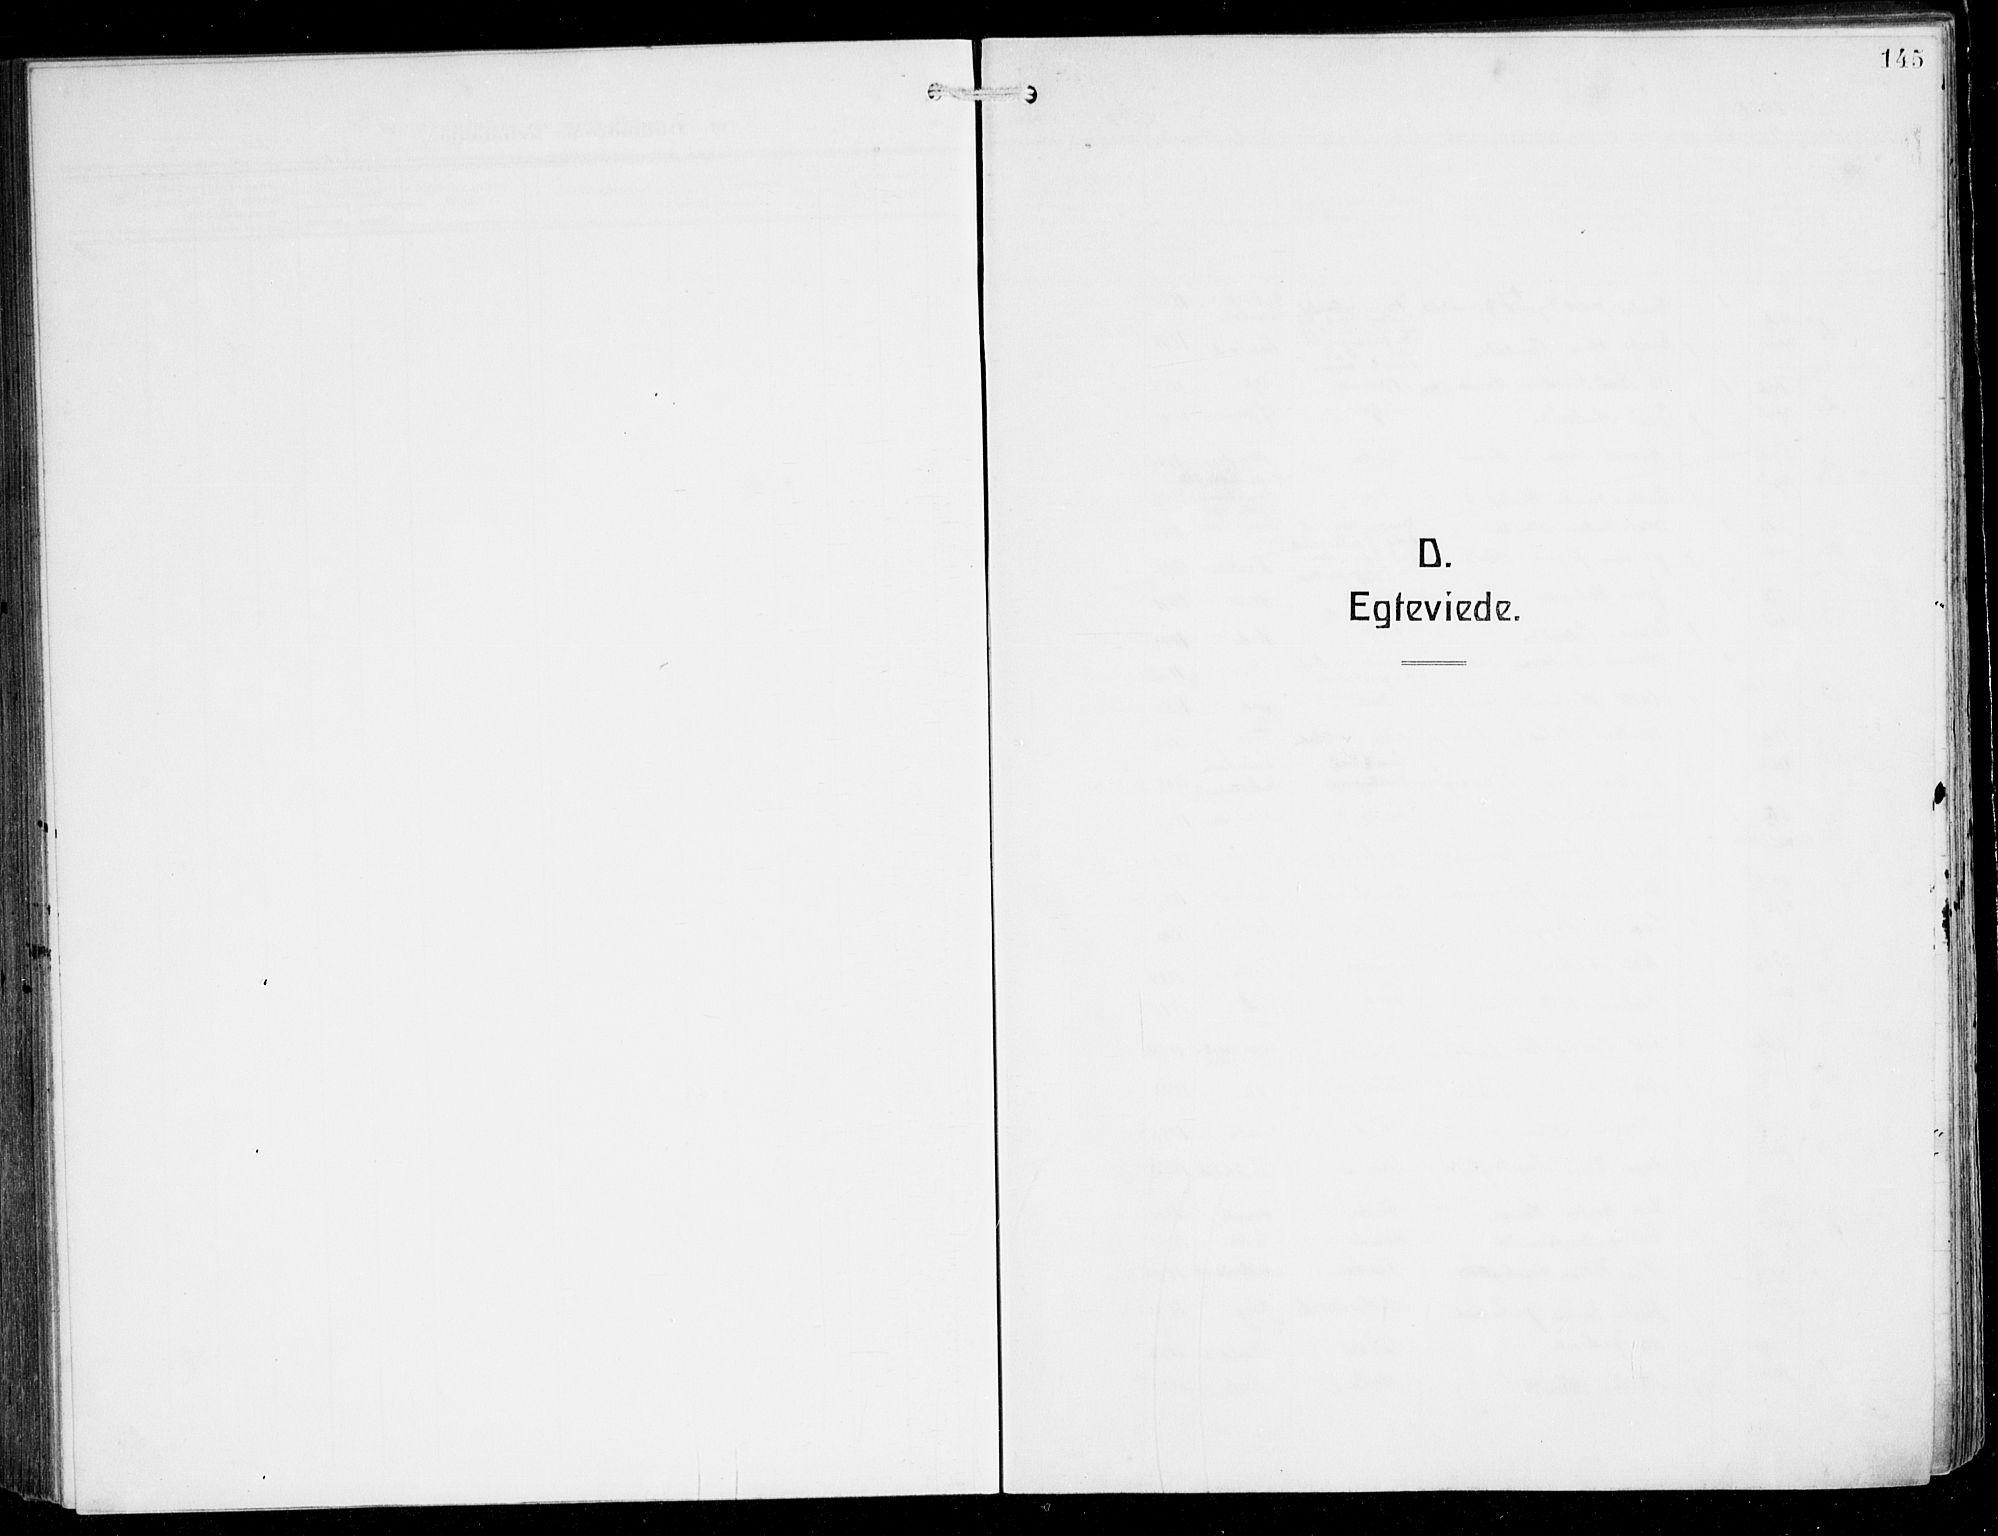 SAB, Herdla Sokneprestembete, H/Hab: Klokkerbok nr. C 2, 1913-1926, s. 145